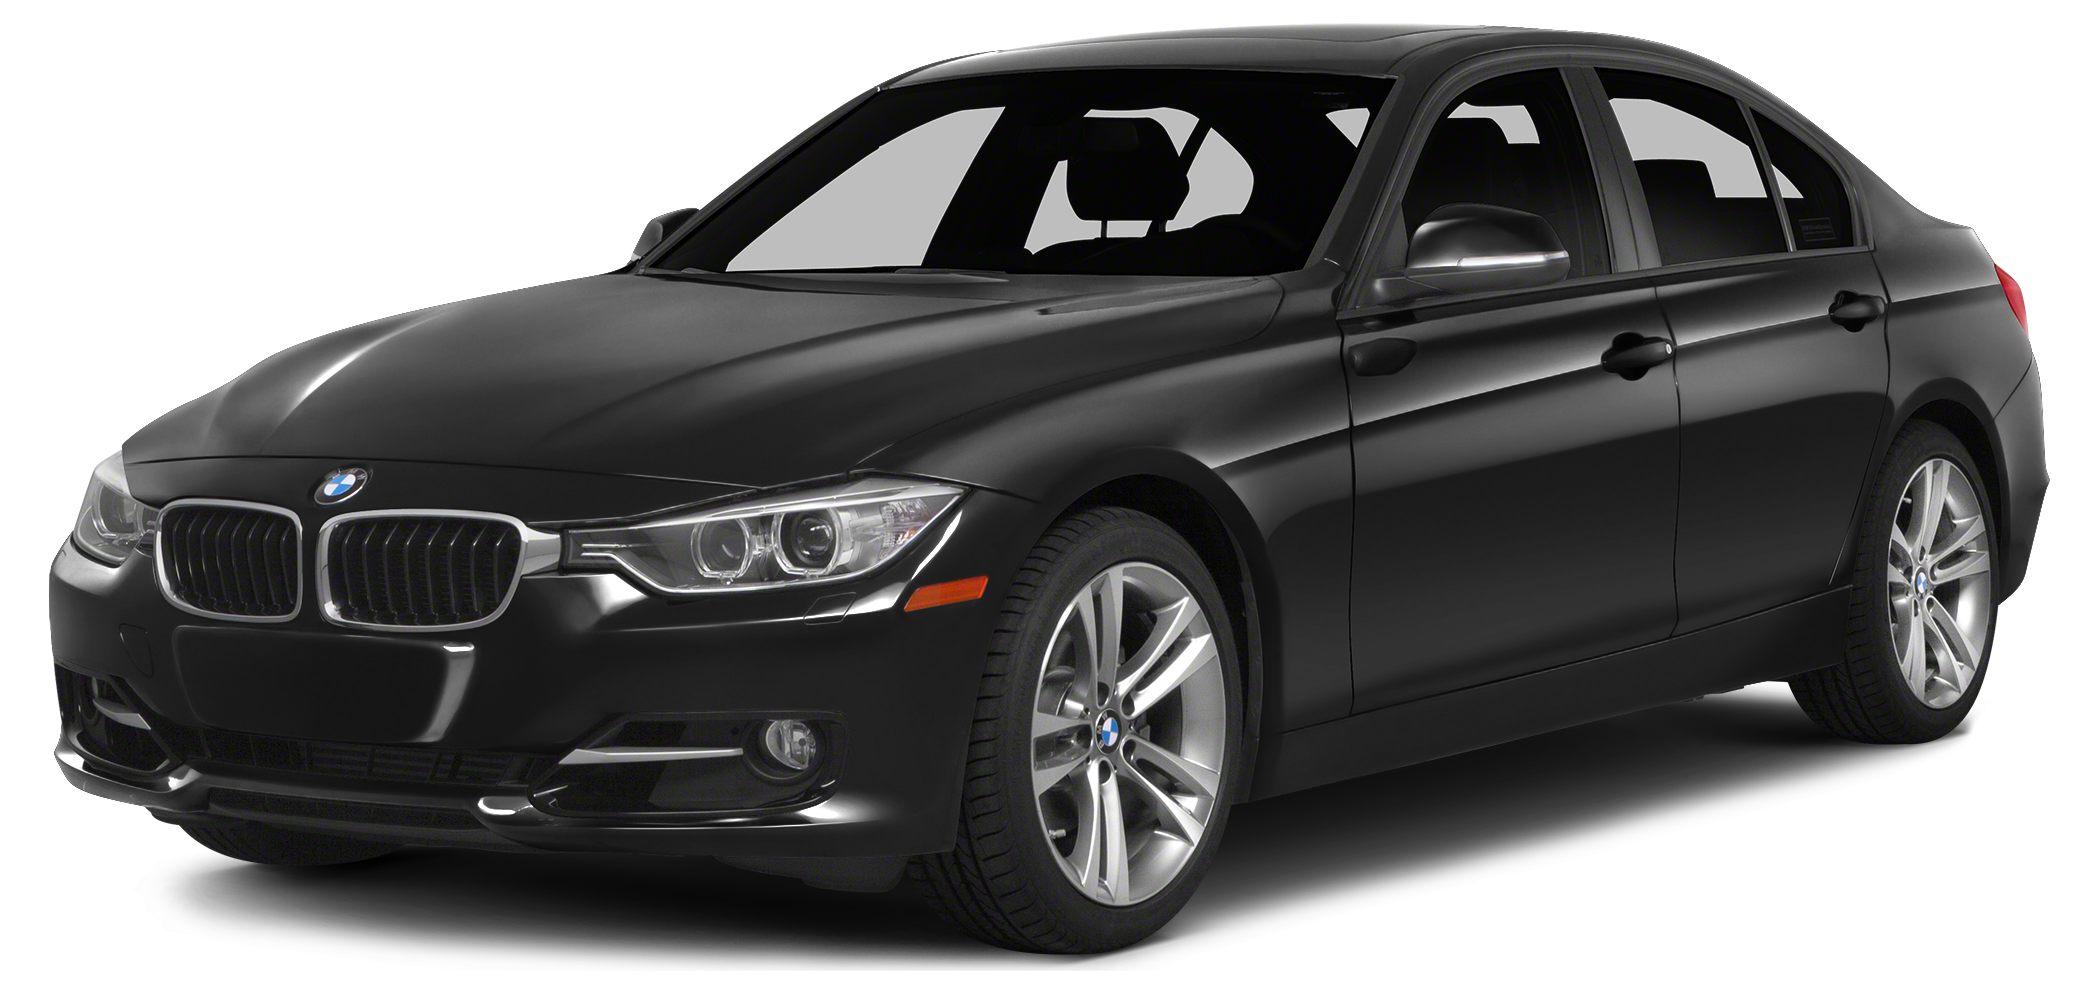 2013 BMW 3 Series 328i xDrive SPORT PACKAGE NAVIGATION LOW MILES 3 SERIES ONE OWNER GARAGE KEPT